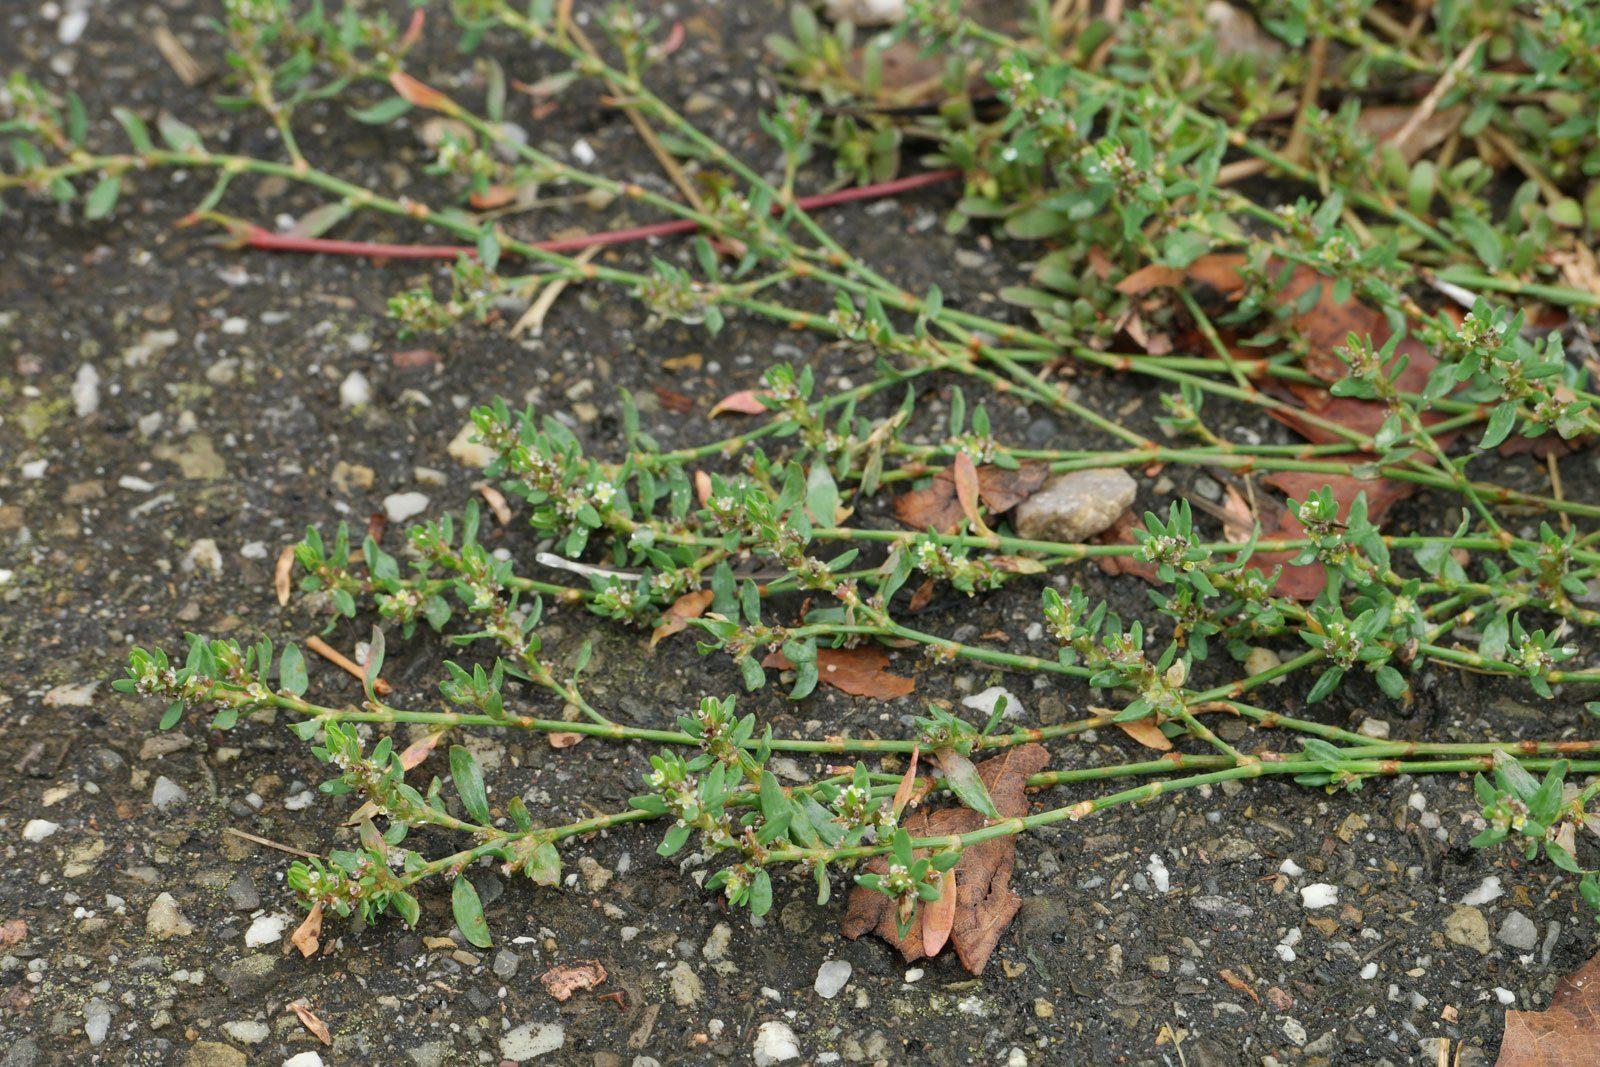 Common Knotgrass